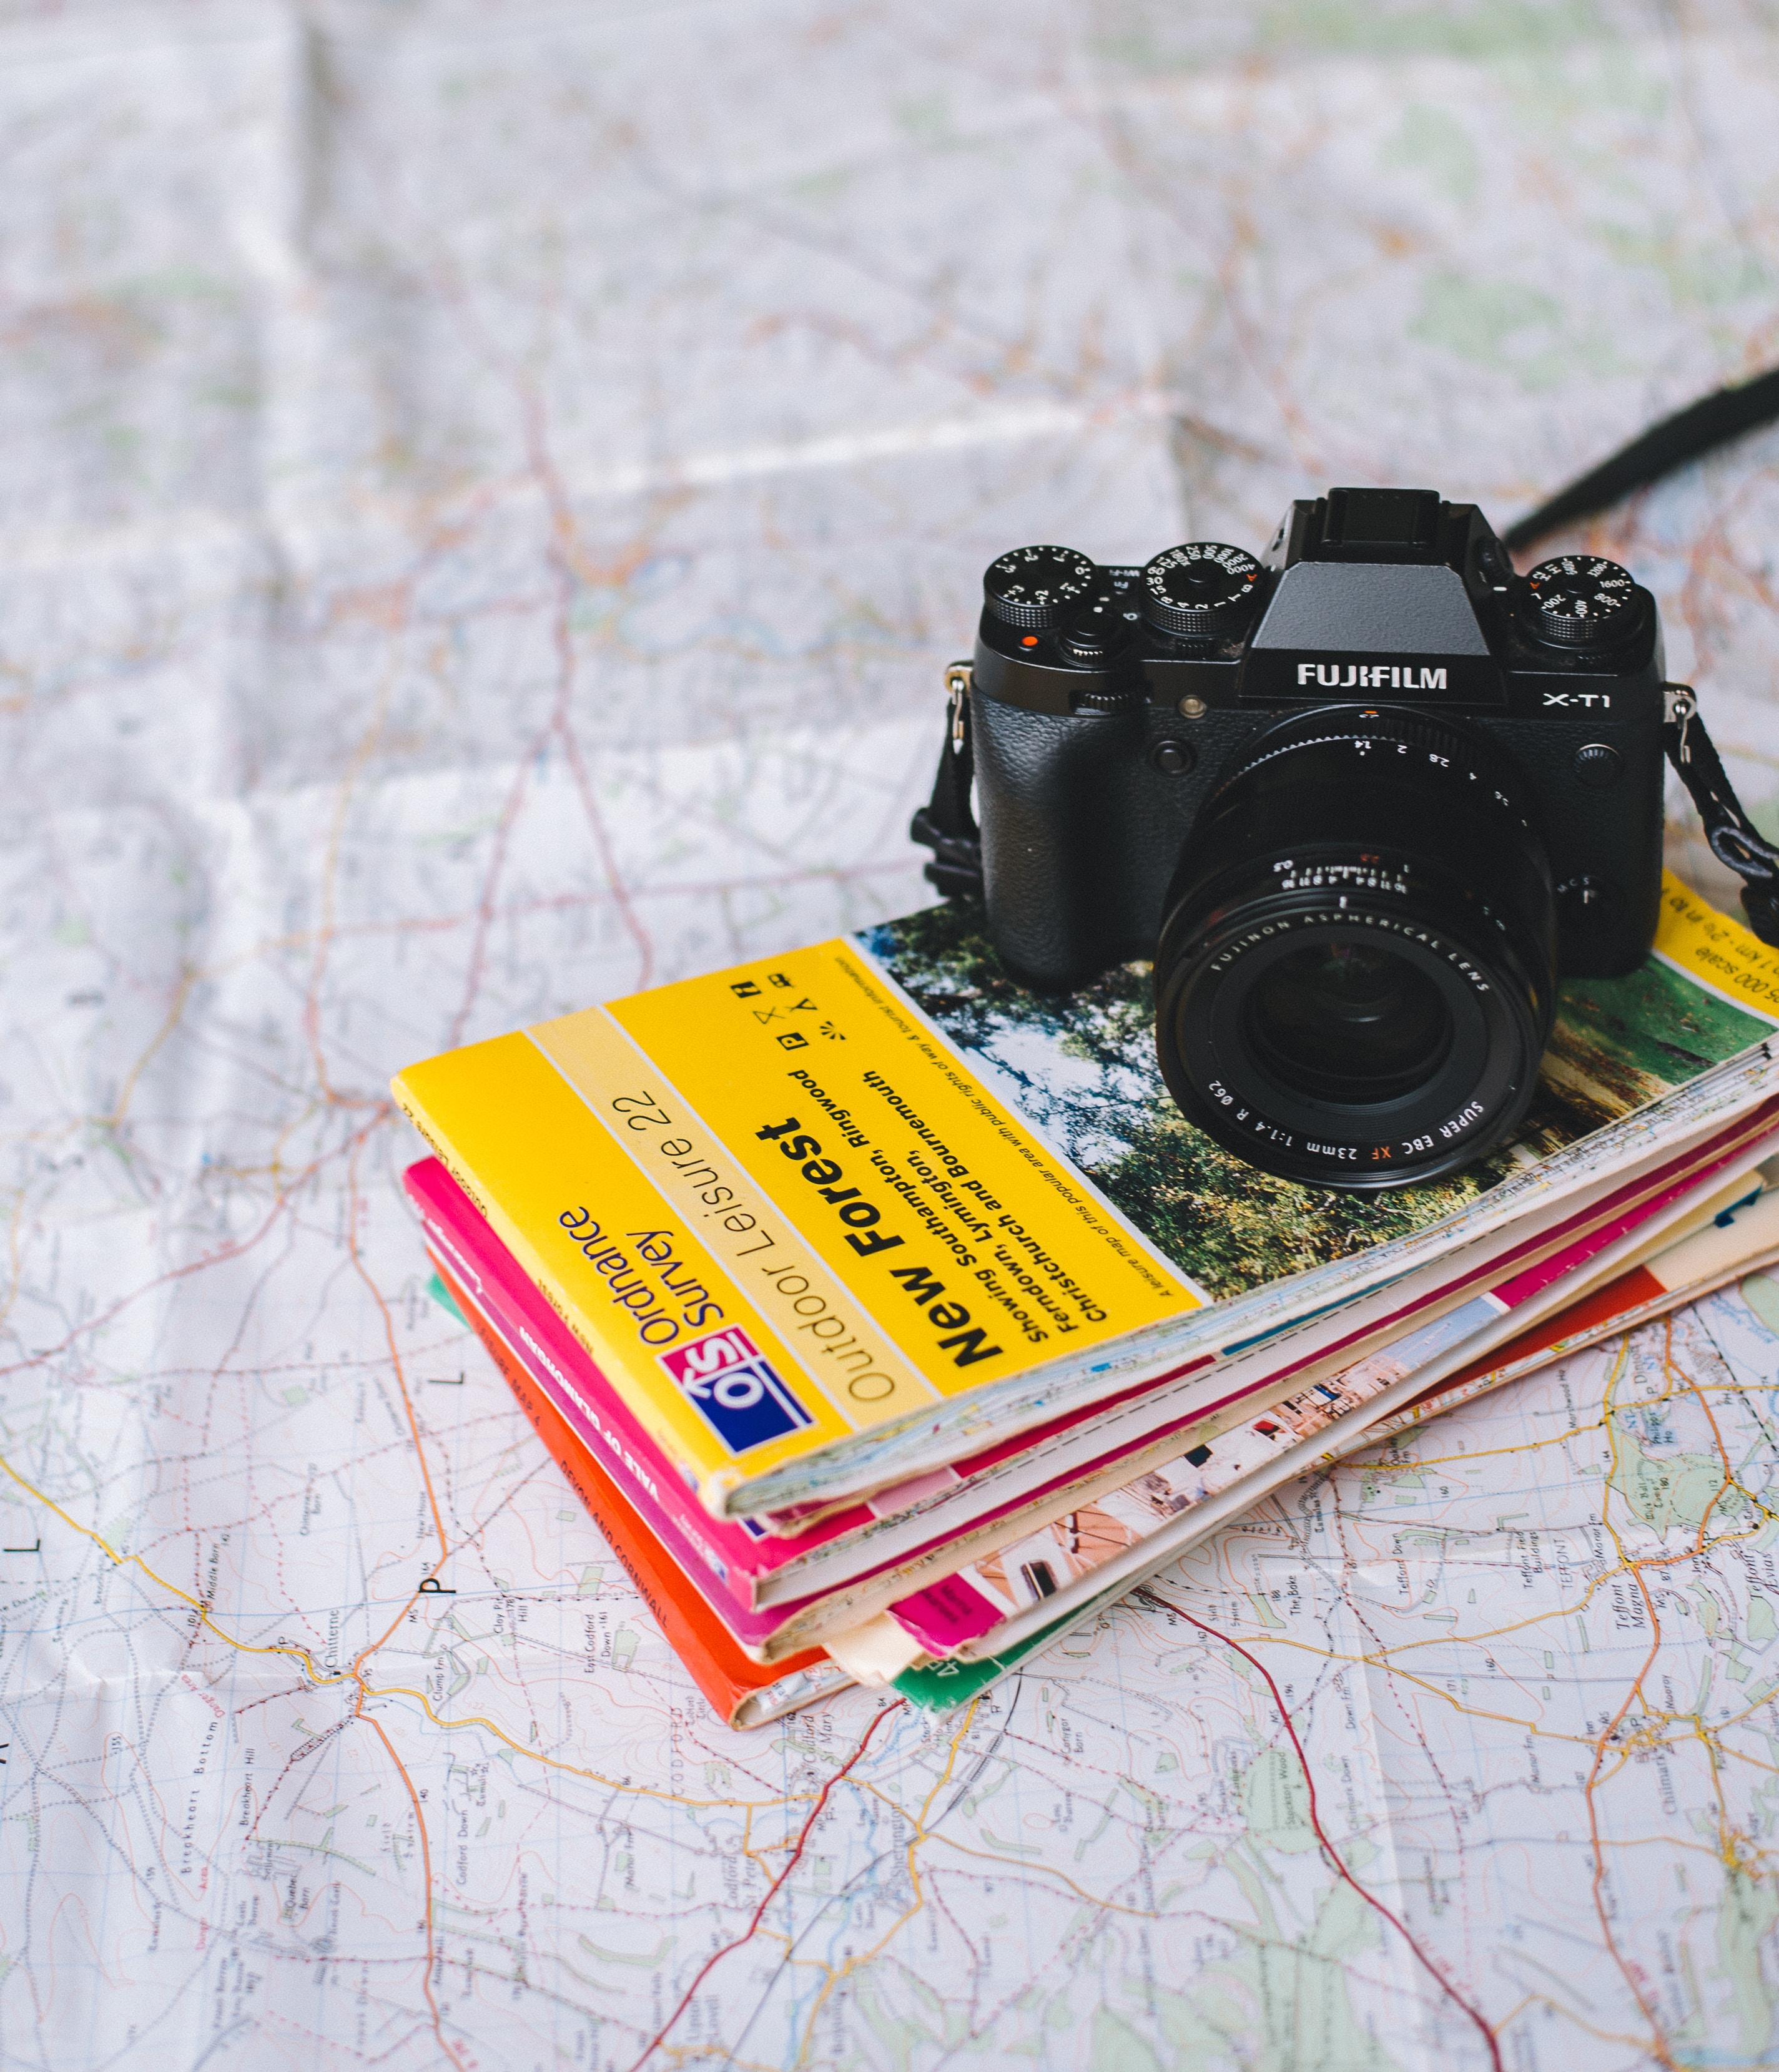 black Fujifilm DSLR camera on books